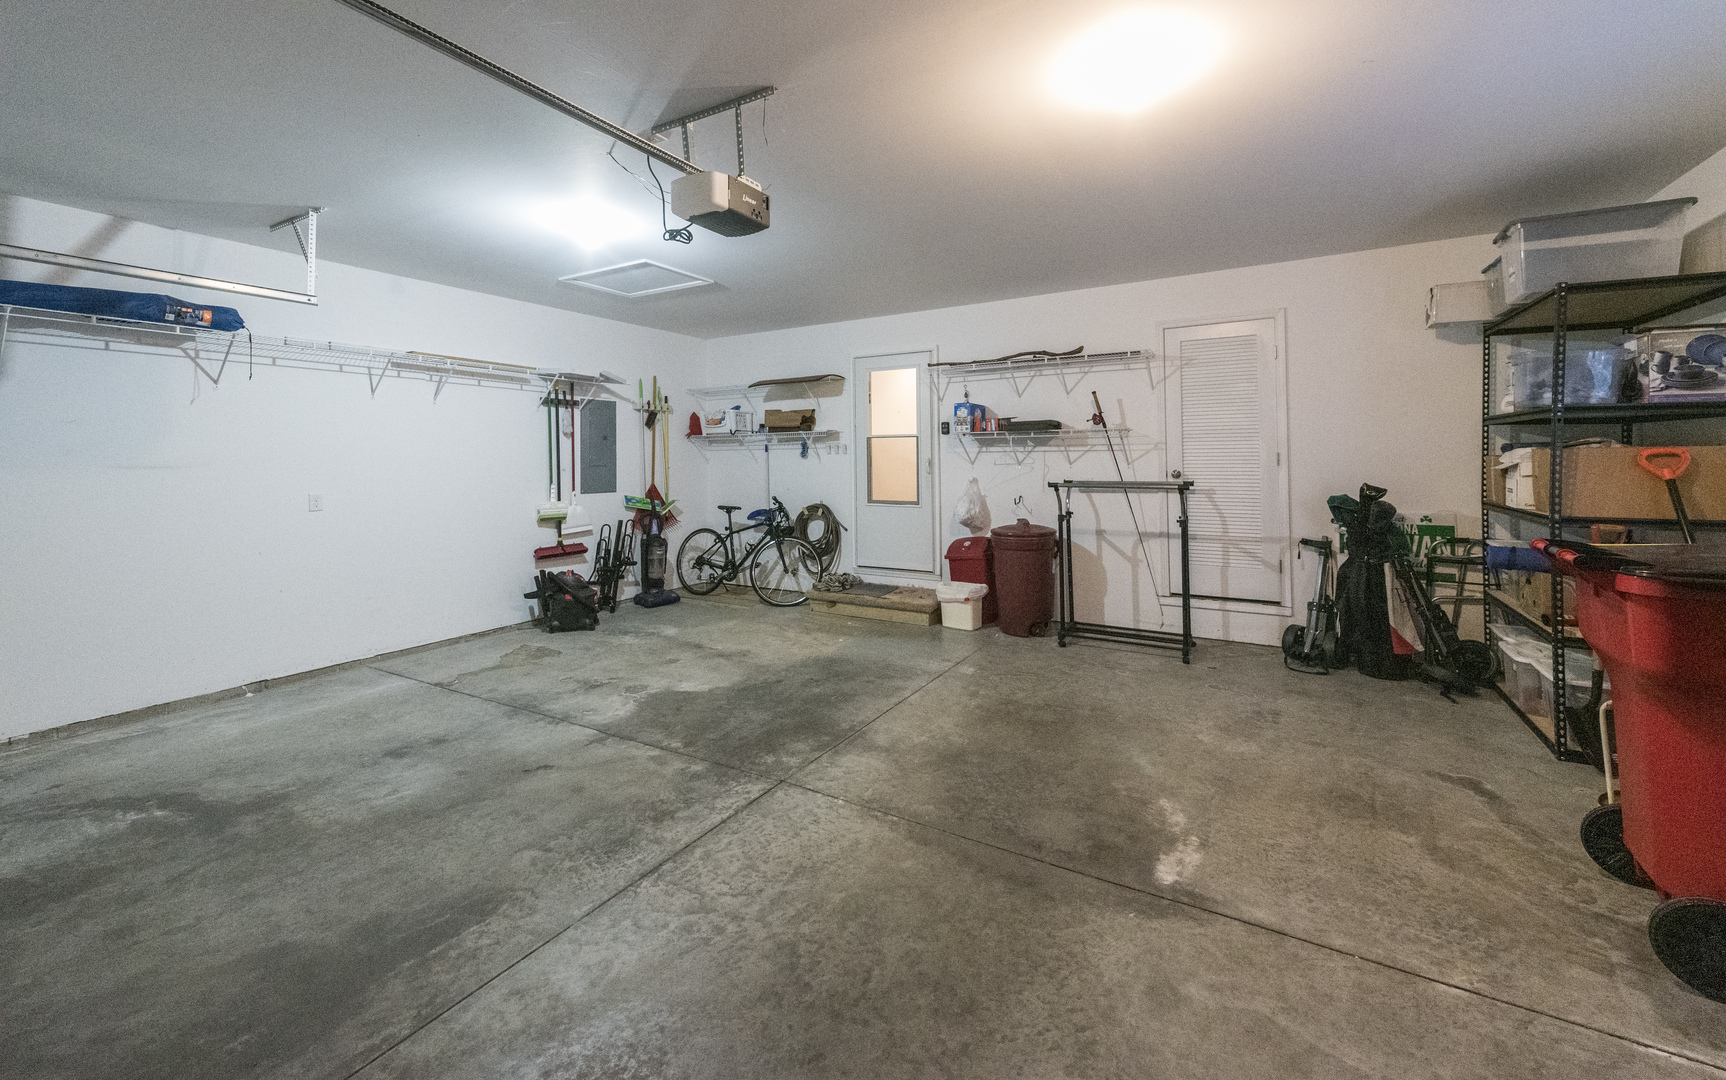 728 SEDGEGRASS, Champaign, Illinois, 61822